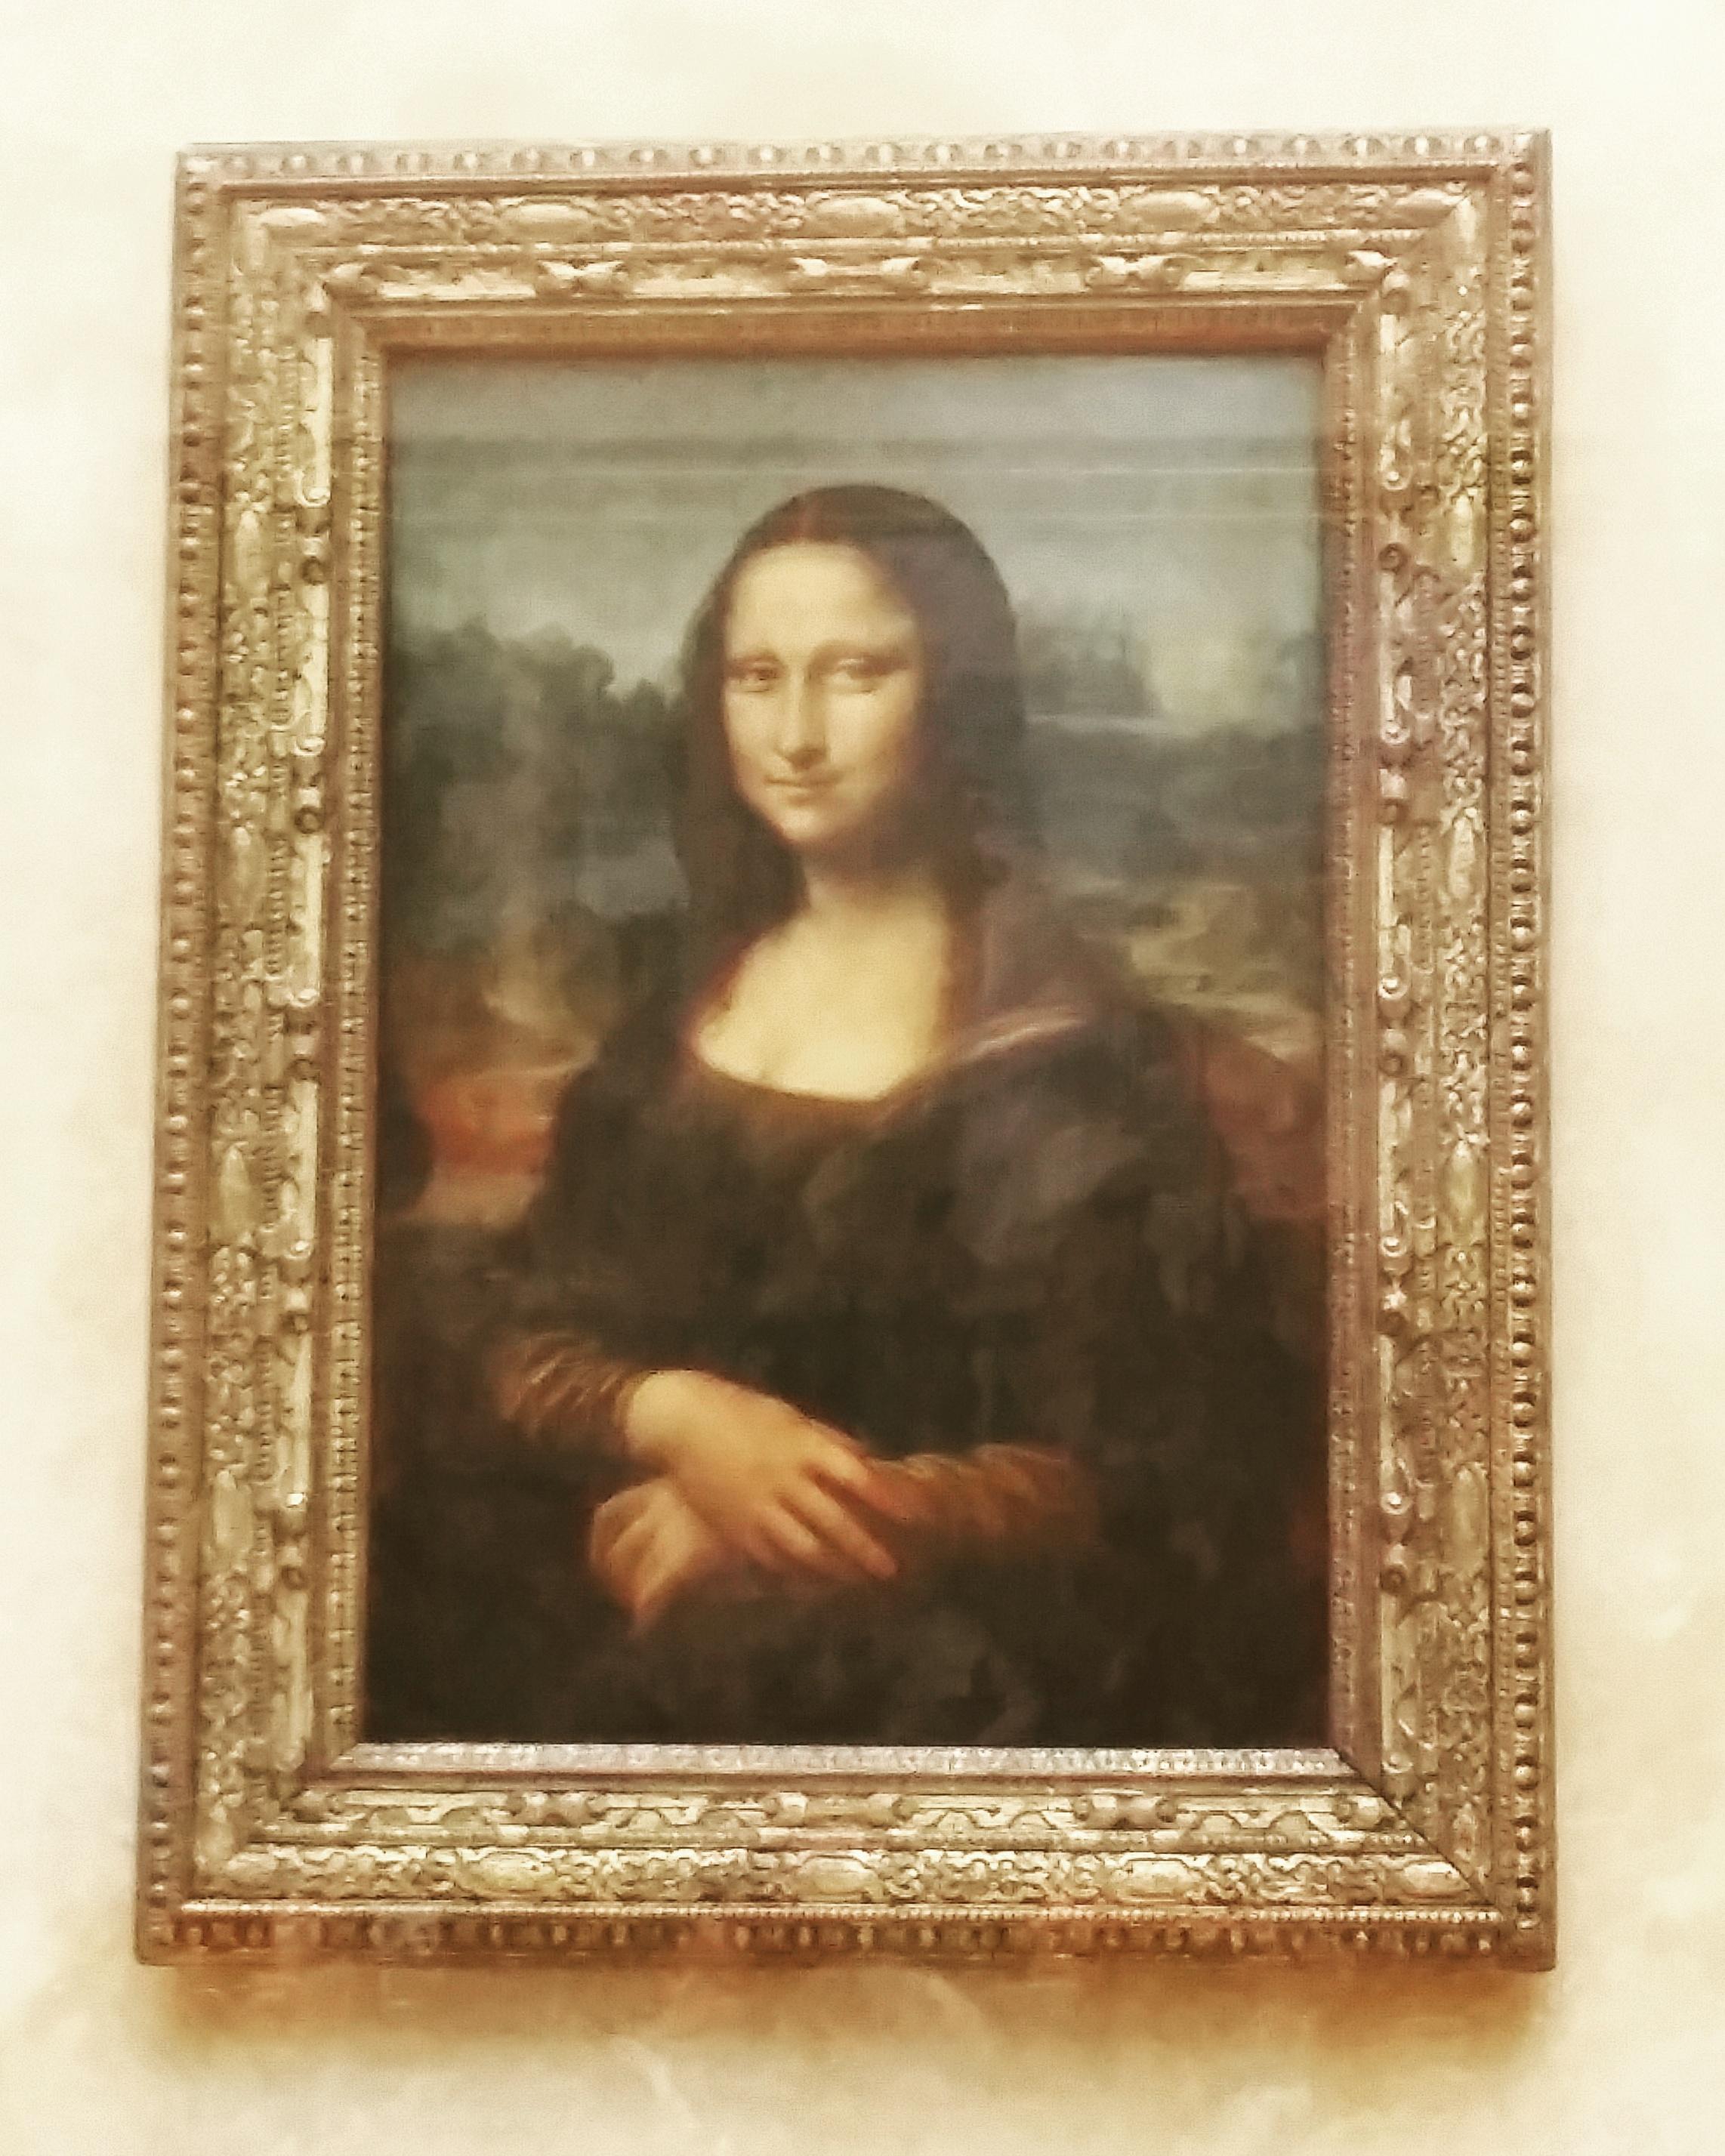 Mona Lisa - Leonardo da Vinci (Louvre)